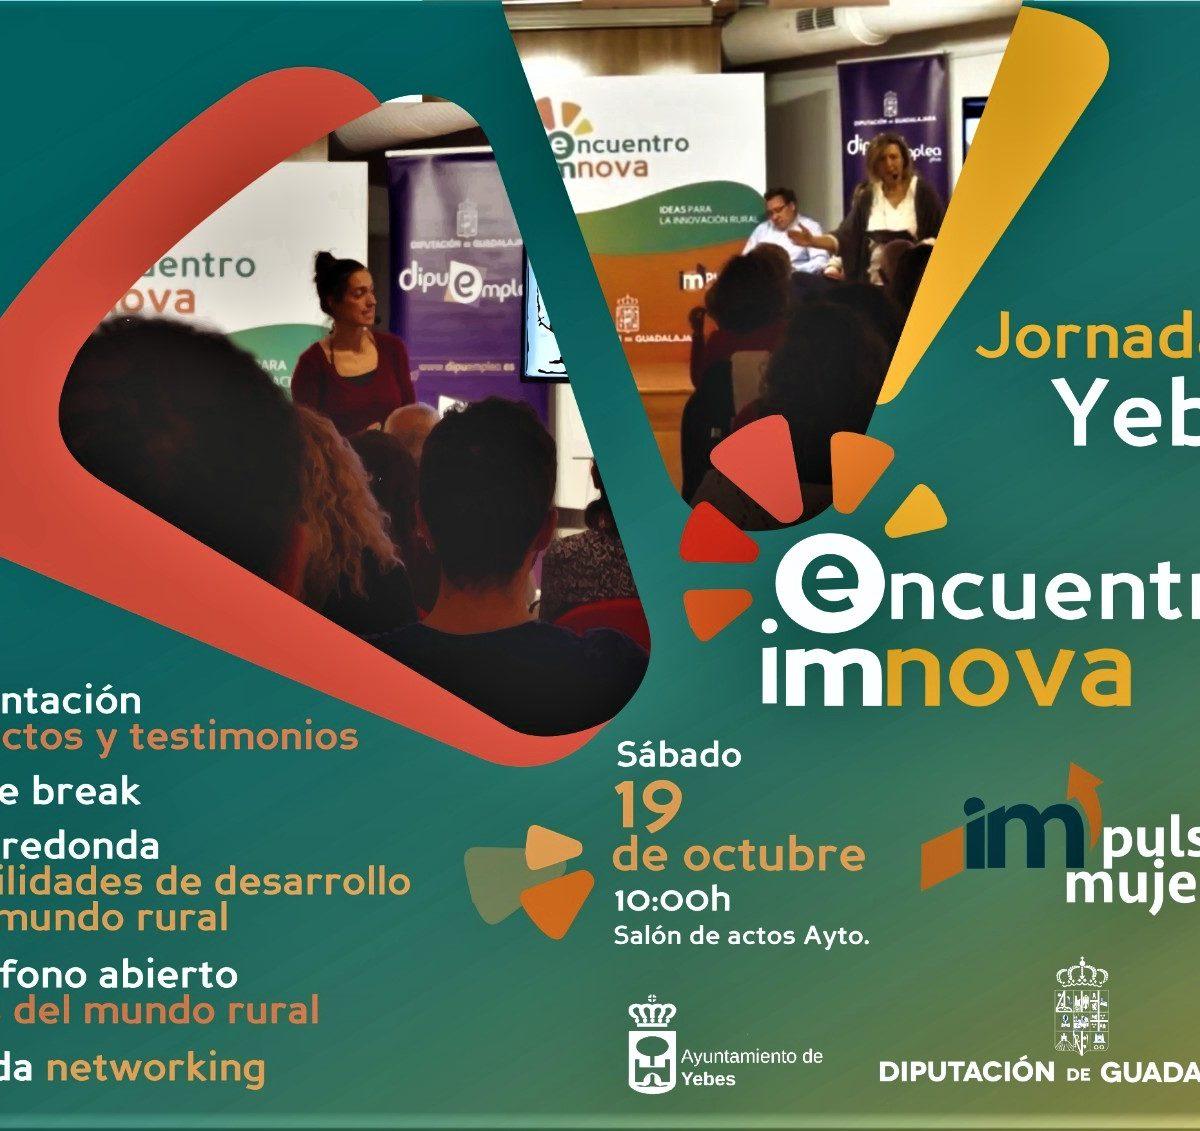 Cartel Encuentro IMNOVA en Yebes (19 oc 2019)